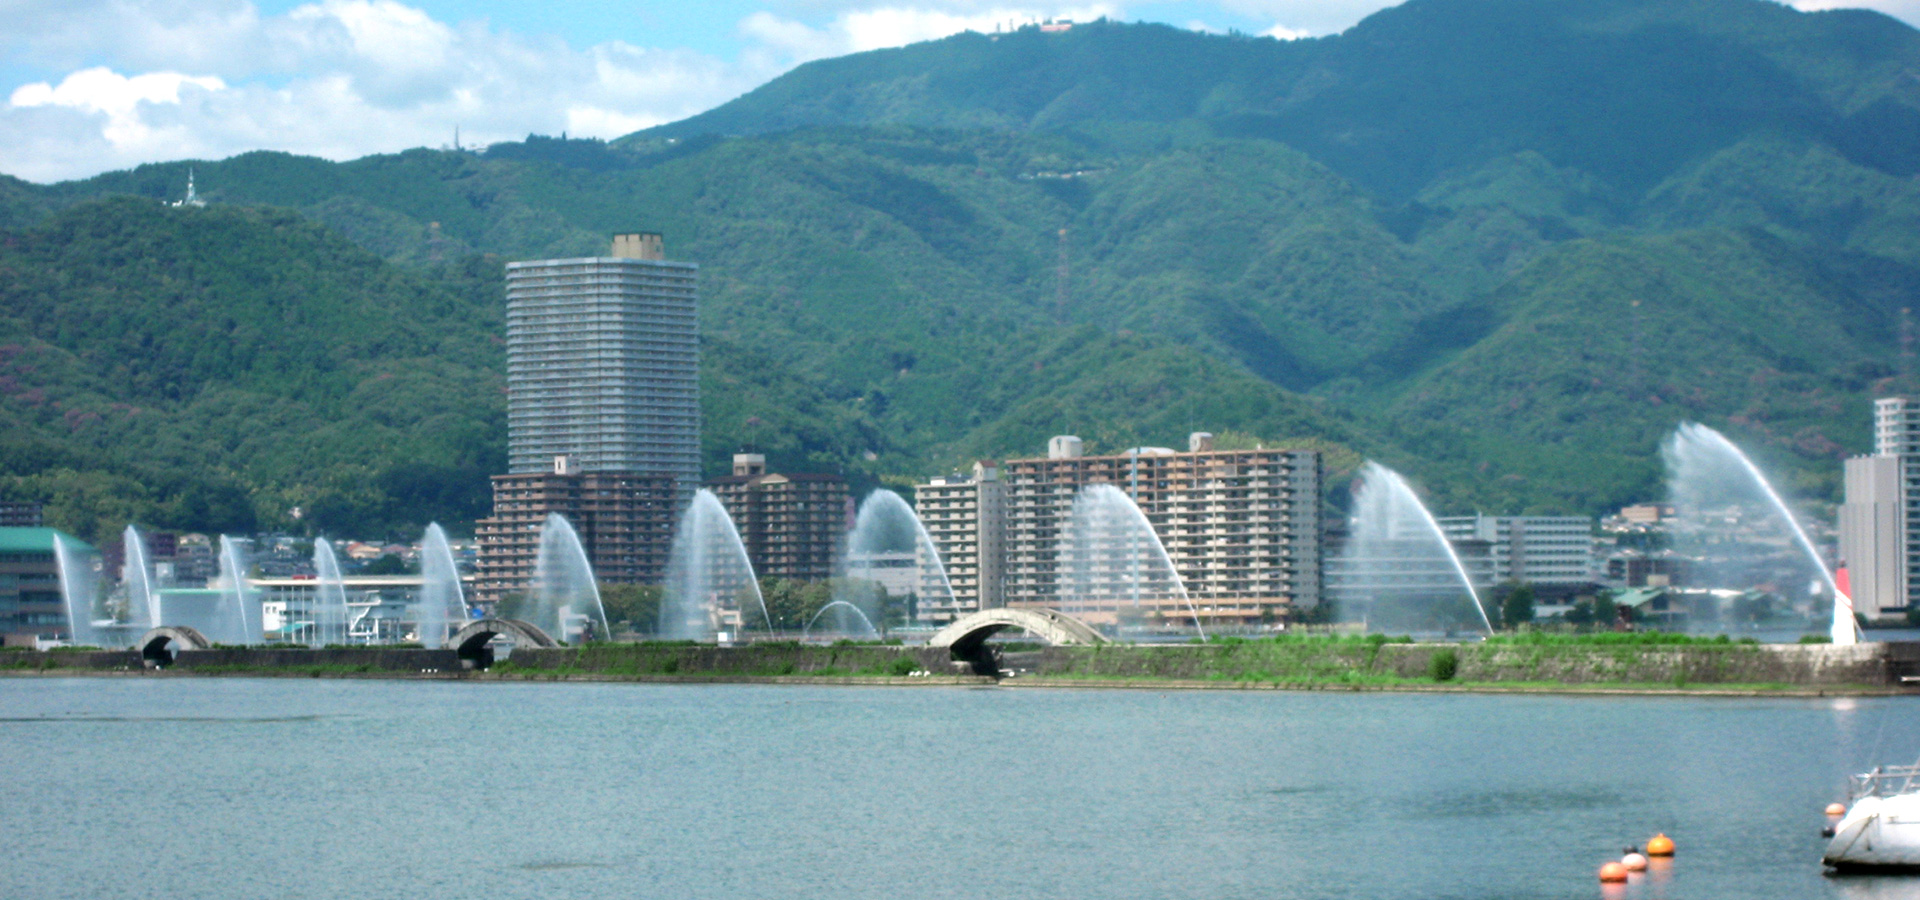 Biwako Hana Funsui (Lake Biwa flower fountain)